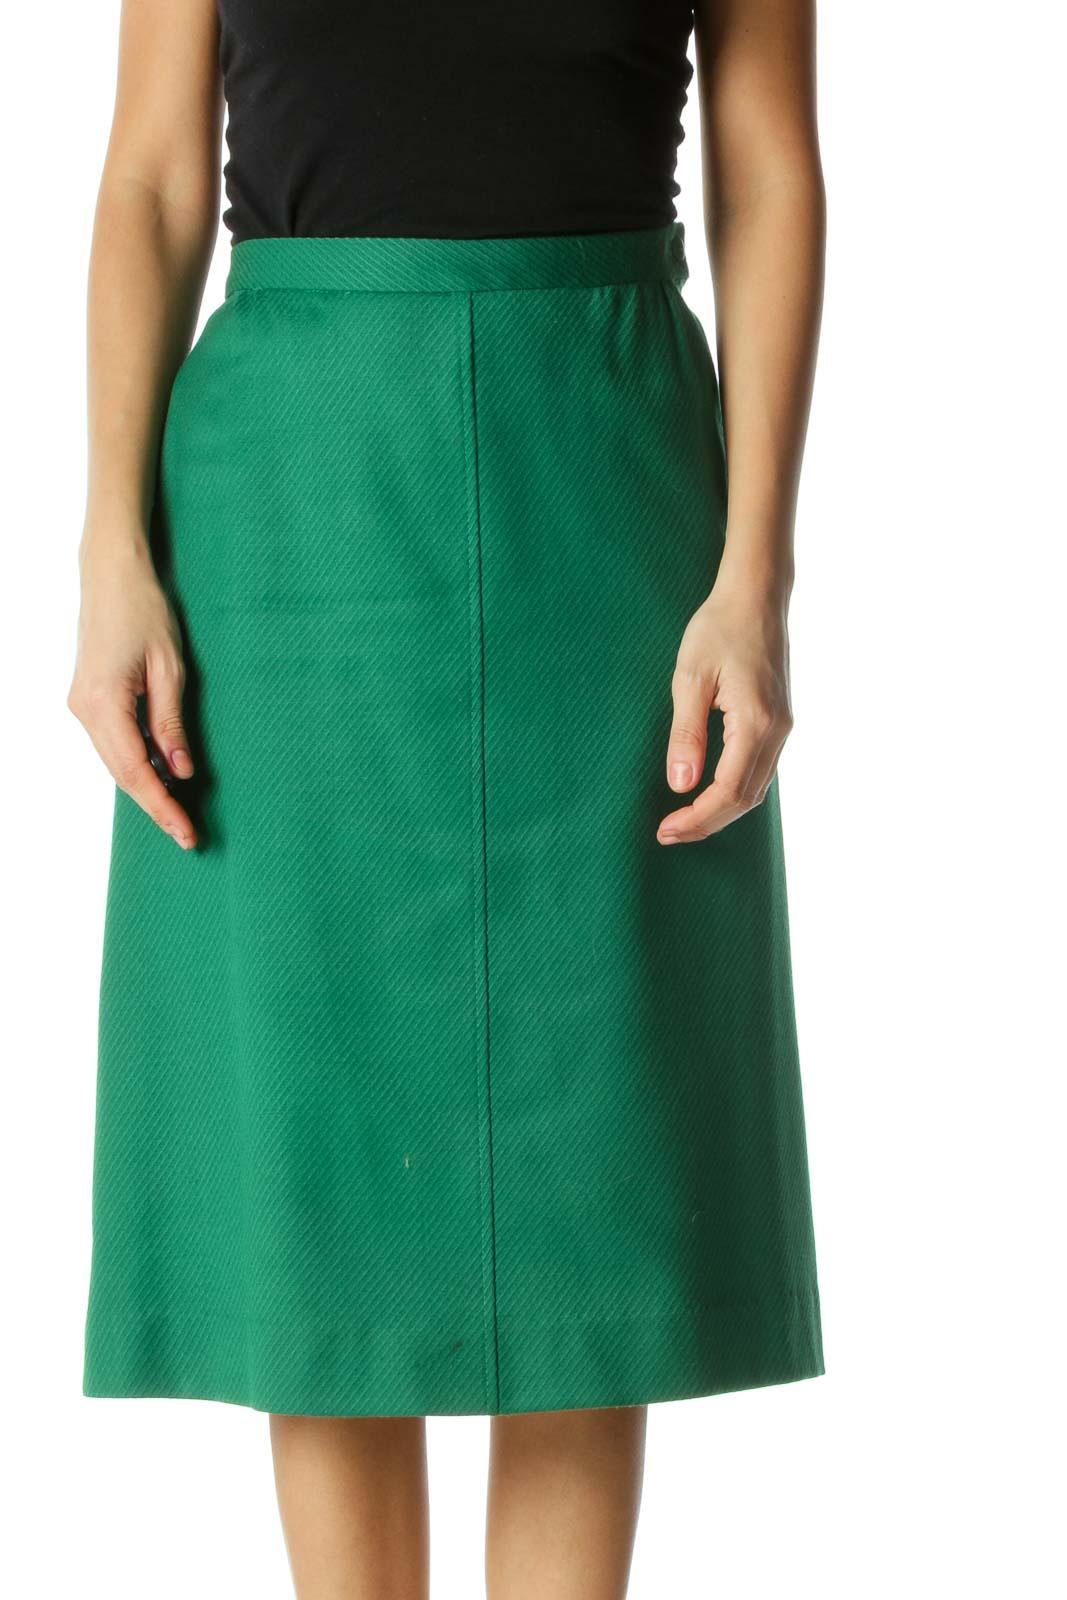 Green A-line Skirt Front